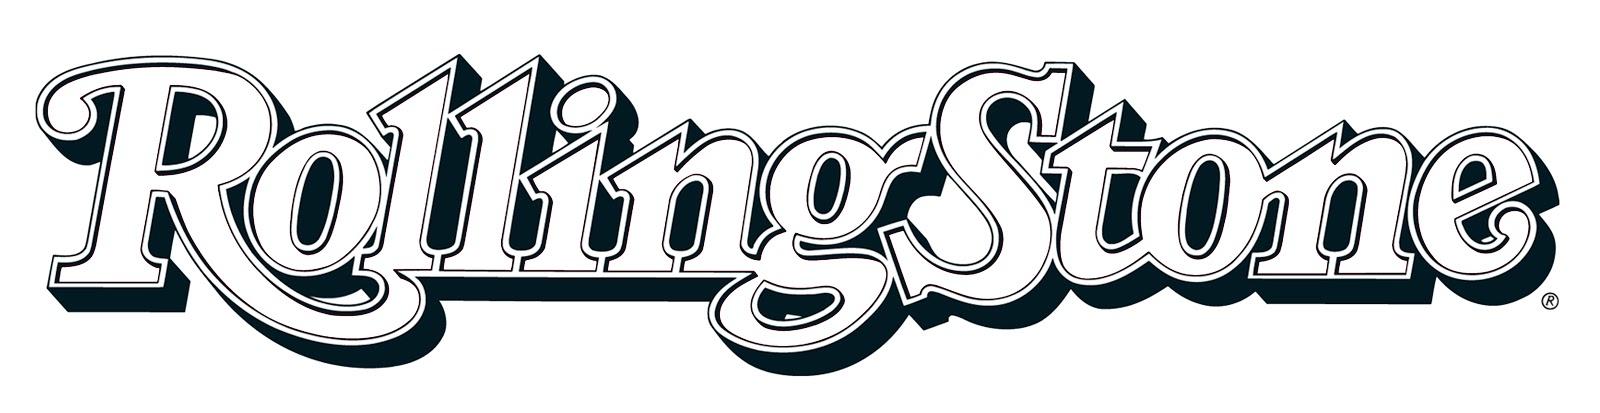 rolling stone magazine logos rh logolynx com rolling stone magazine logo designer rolling stone magazine logo font